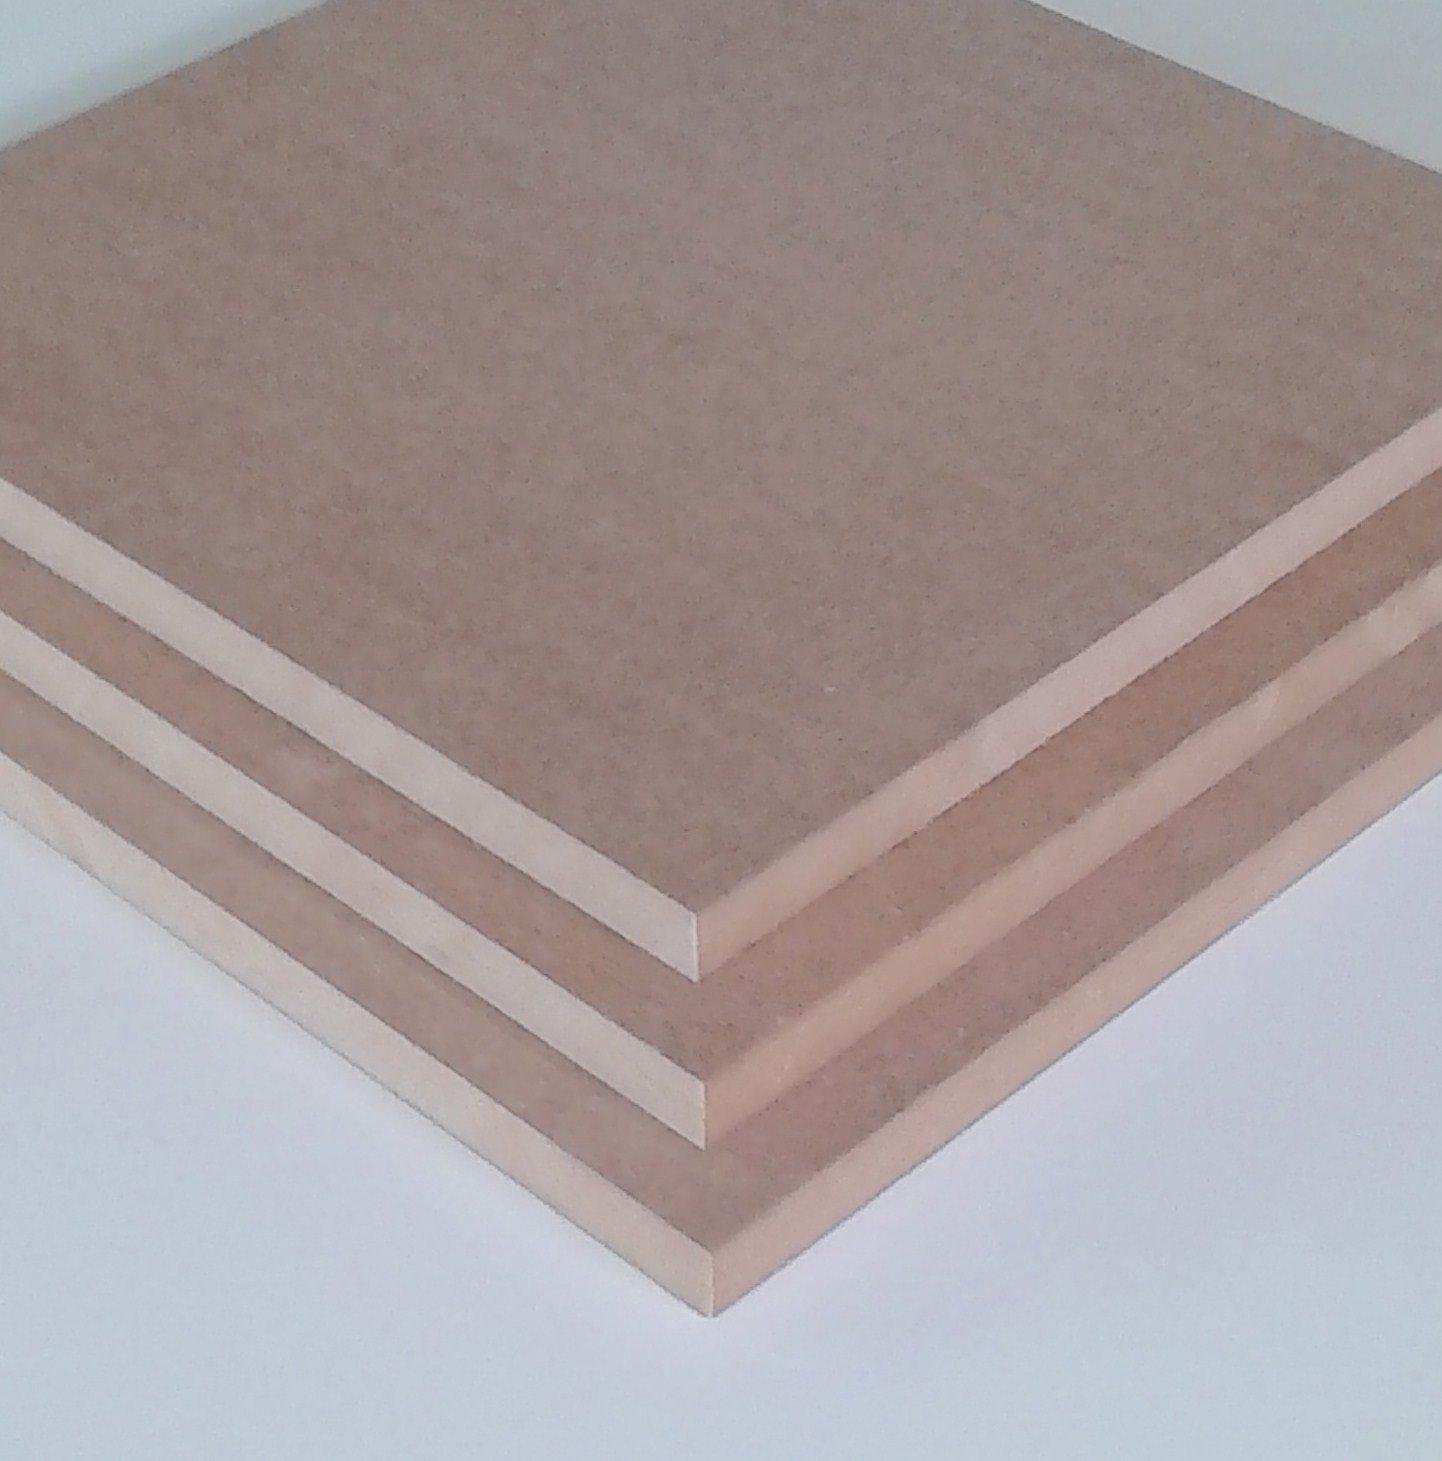 Häufig MDF Platten 25mm stark. Spanplatten, Holzplatten (100x100mm LS48